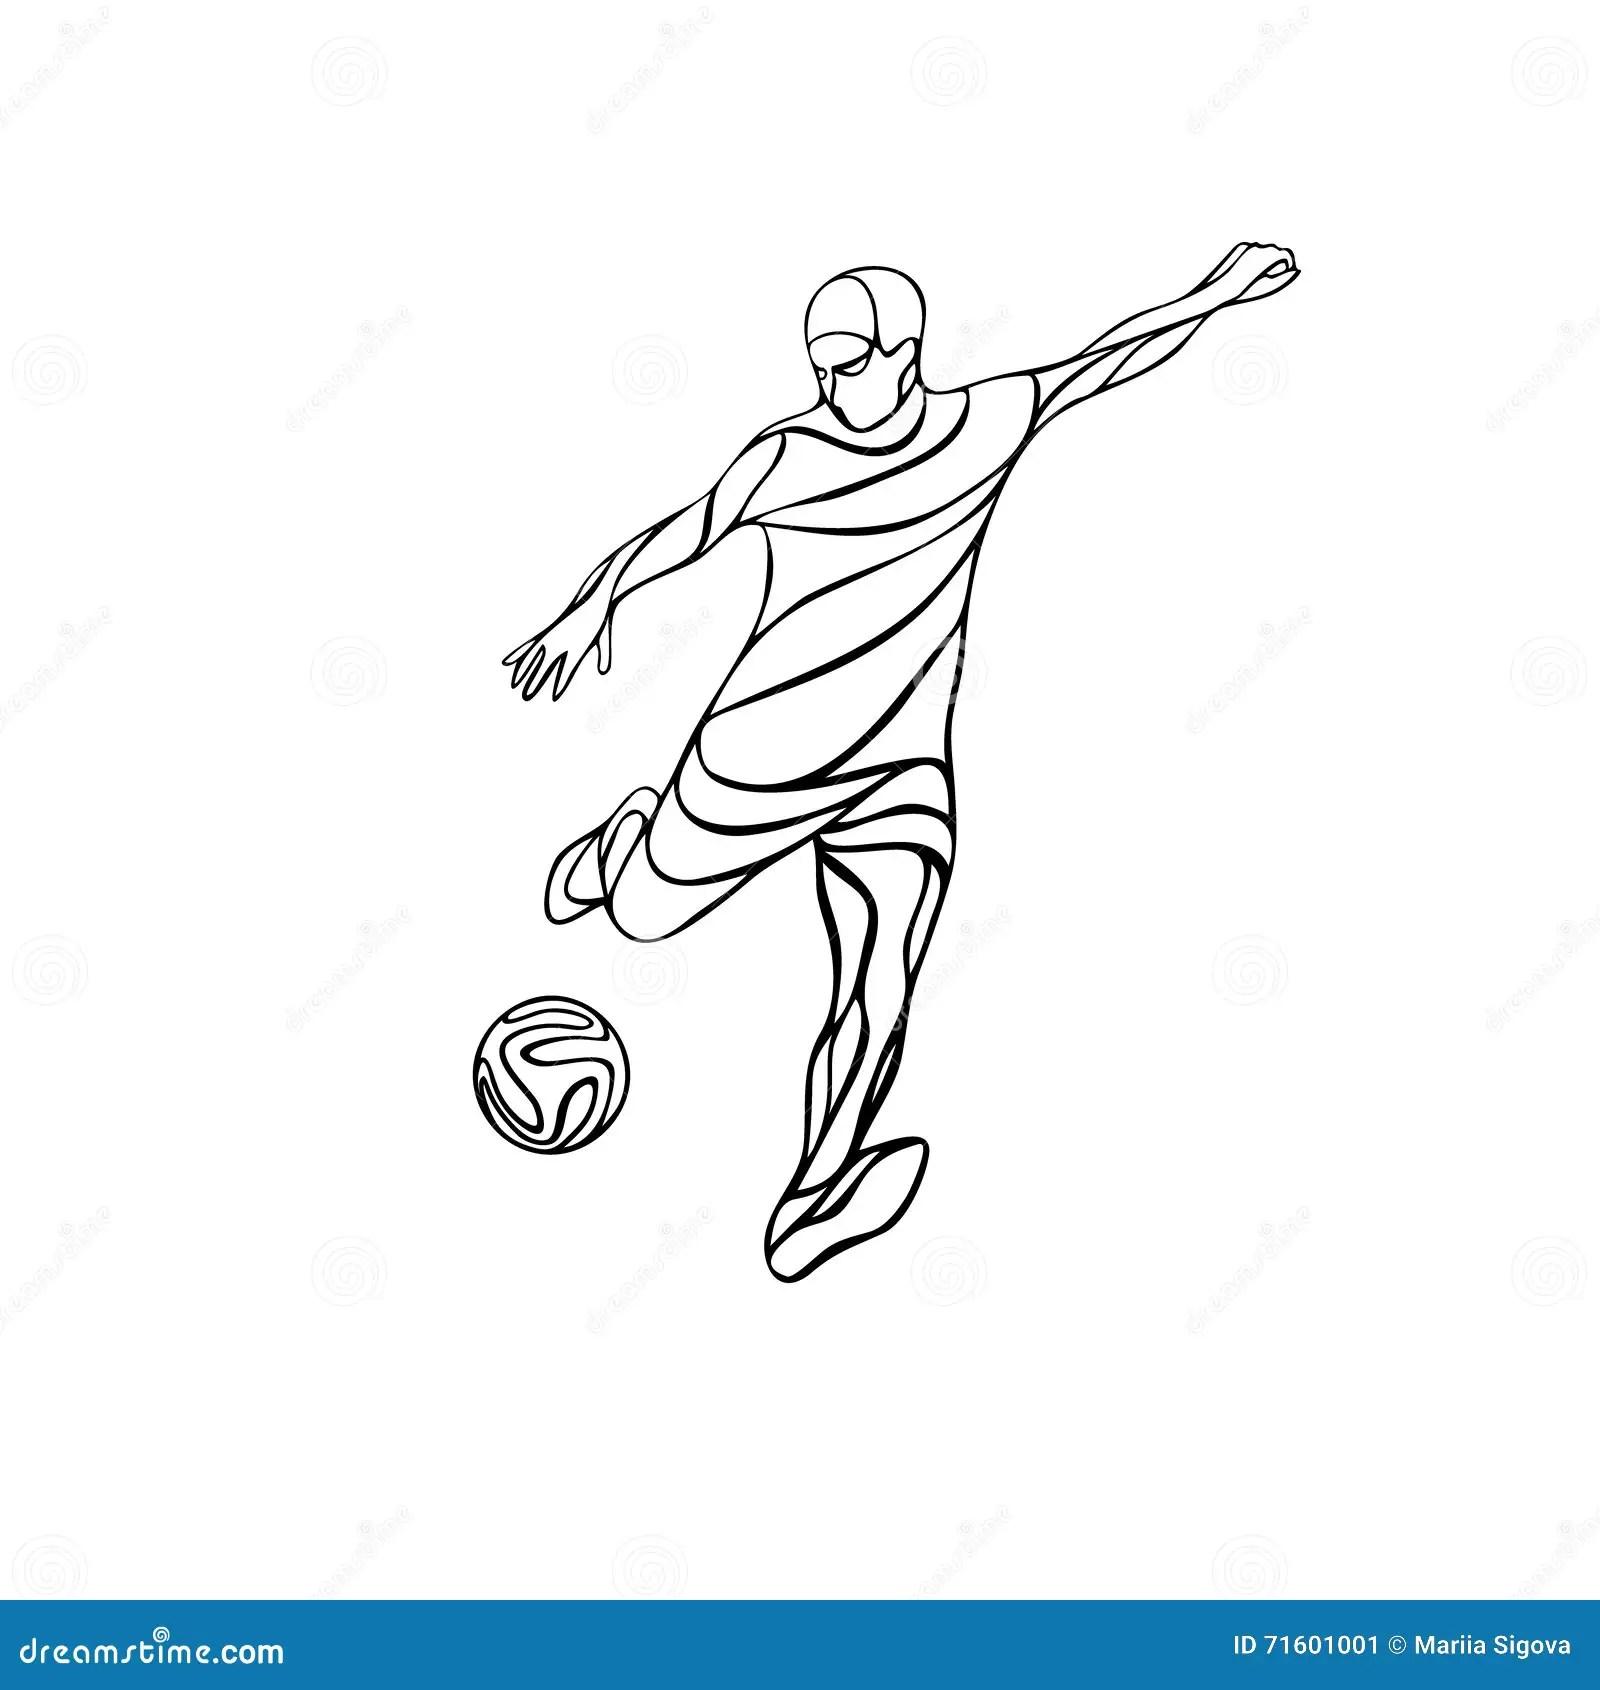 Soccer Or Football Player Kicks The Ball. Cartoon Vector